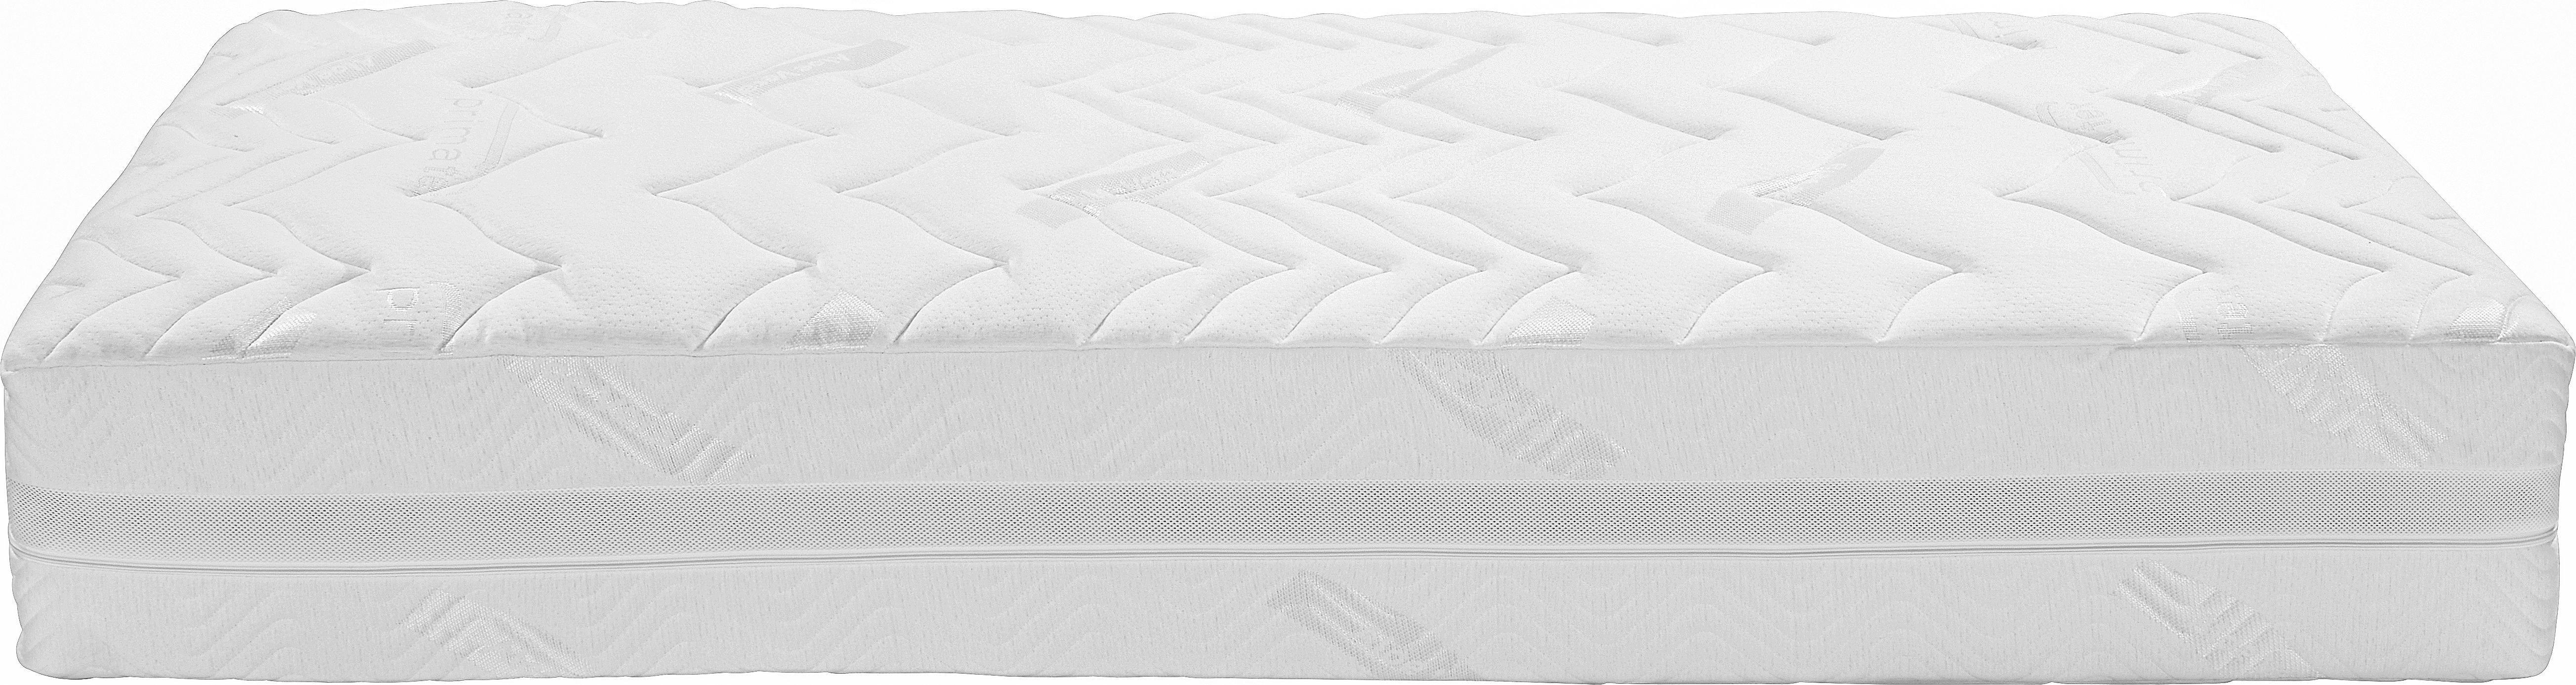 Boxspring Matrac Ergo-box - fehér, textil (90/200cm) - PRIMATEX